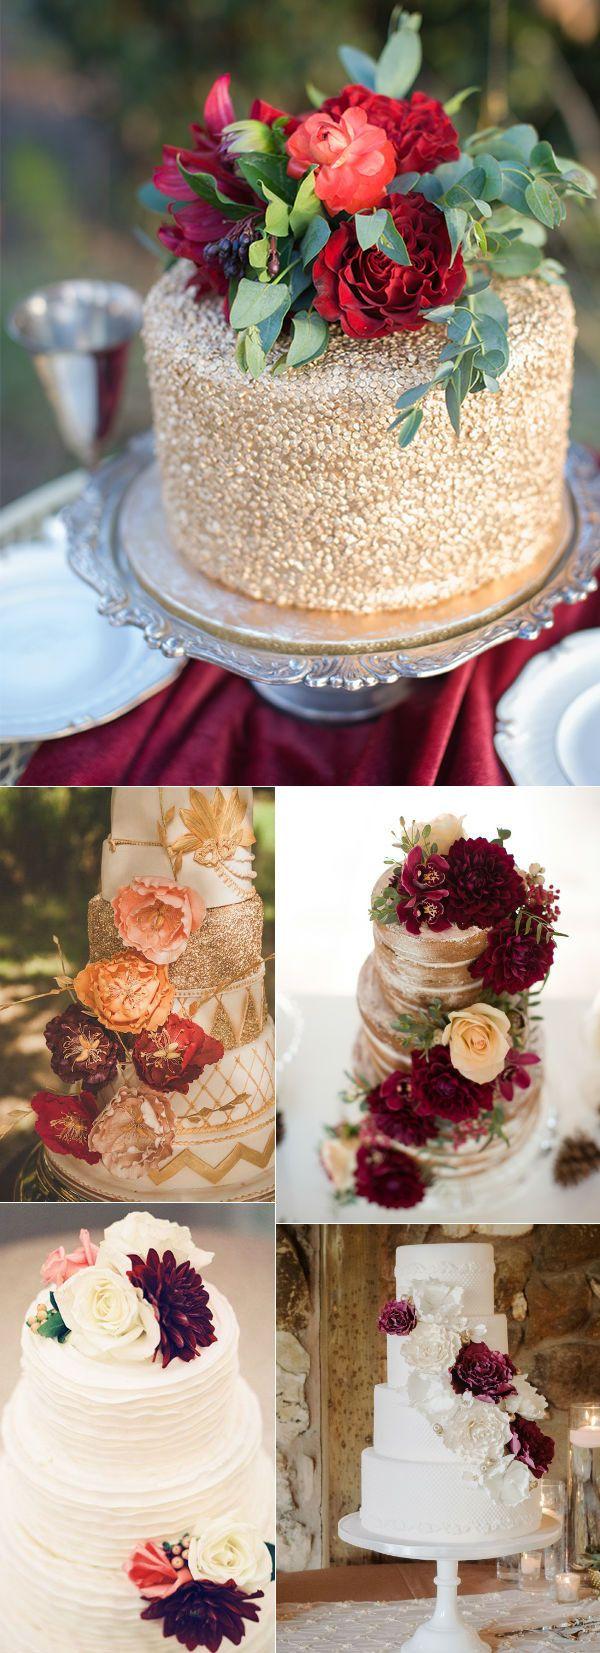 32 Amazing Wedding Cakes Perfect For Fall Wedding cake